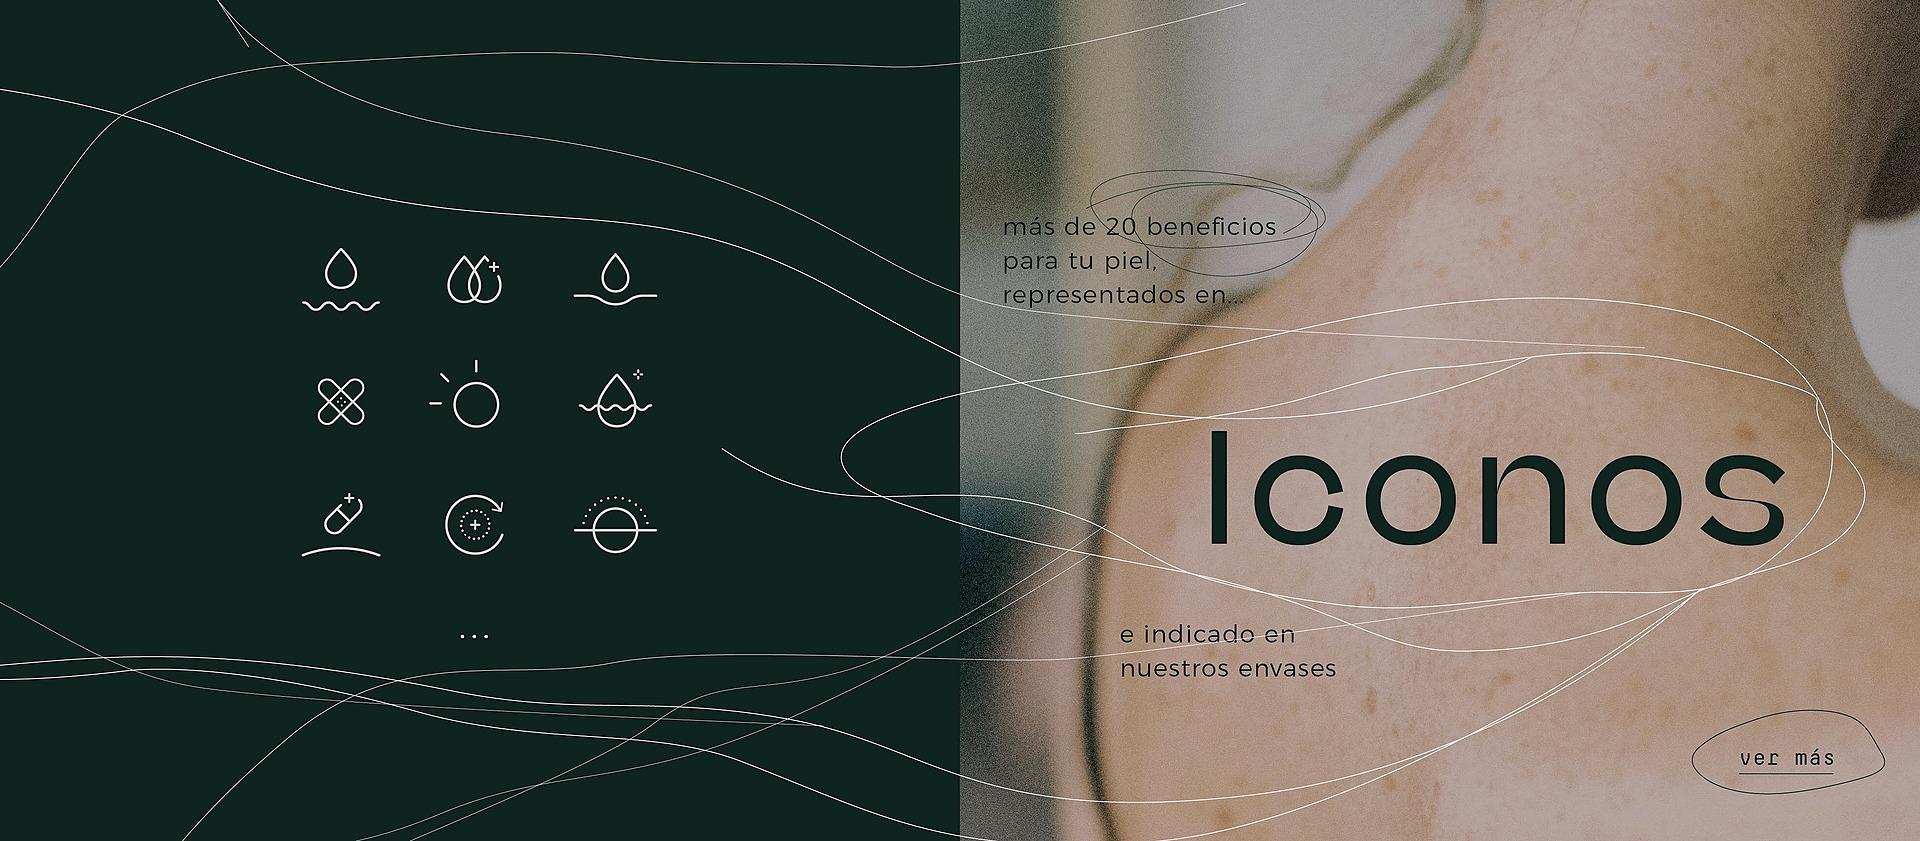 02_Iconos_Mesa_de_trabajo_102_Iconos_Mesa_de_trabajo_1.jpg